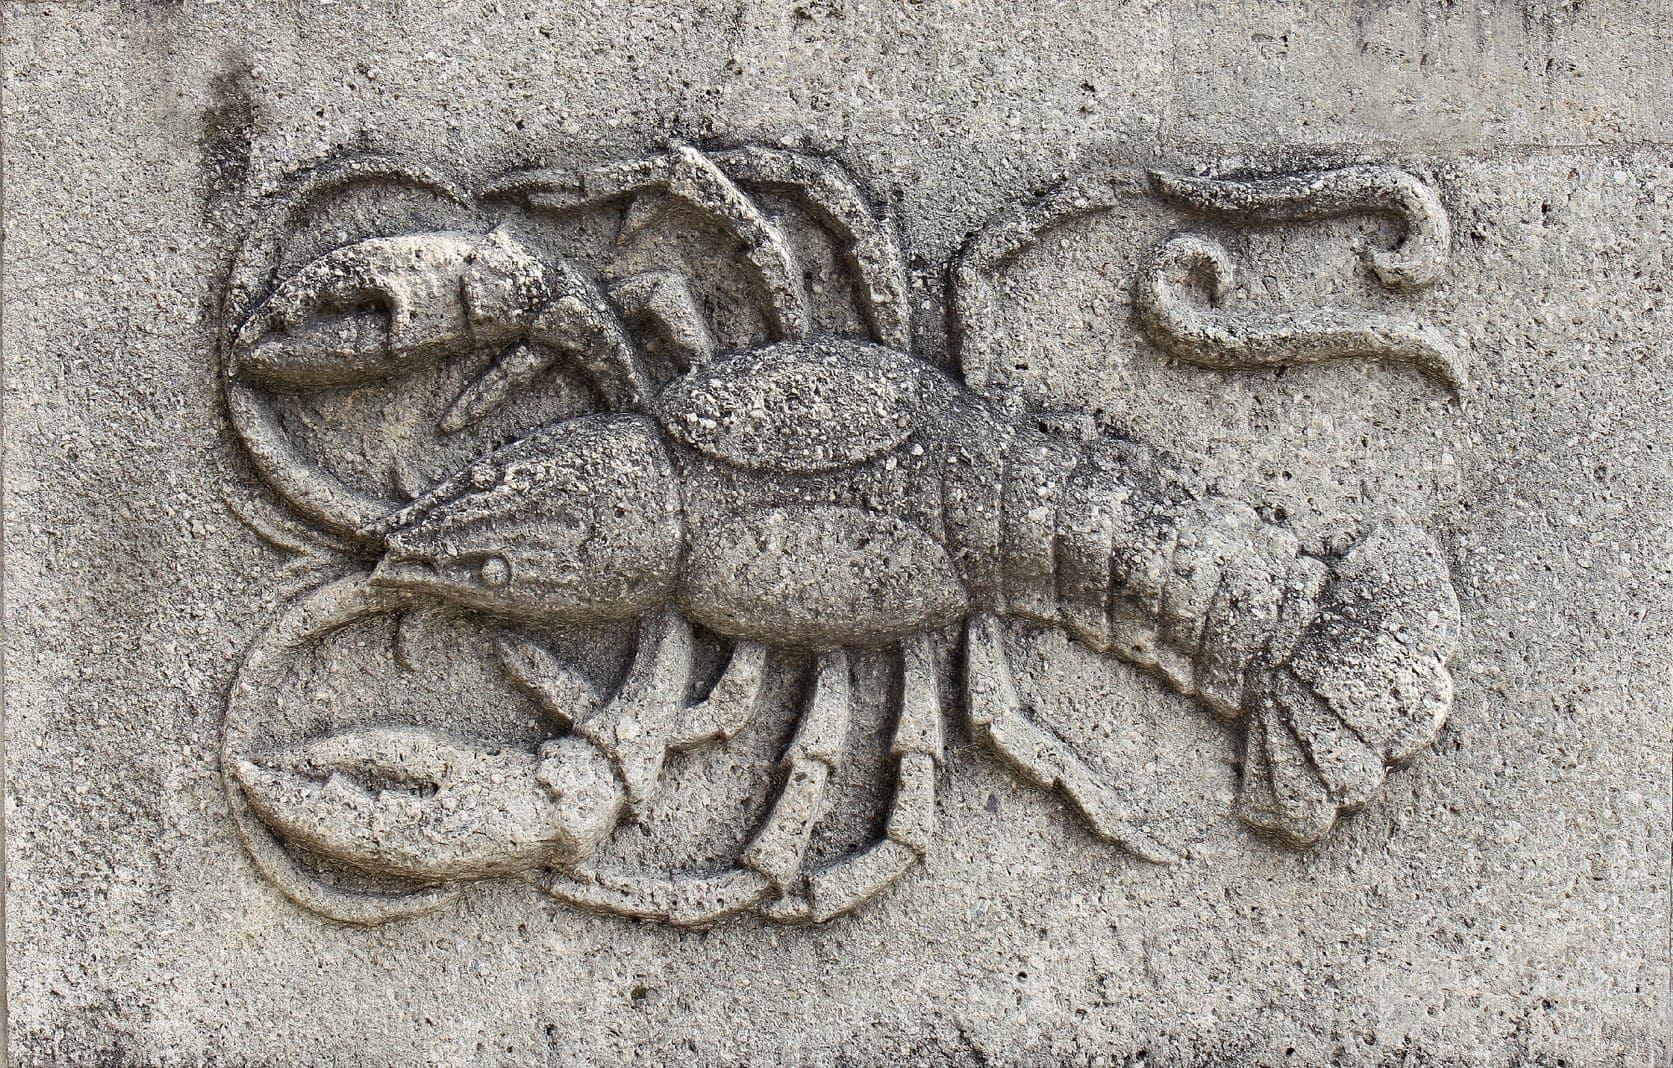 Frau und mann skorpion krebs Skorpion